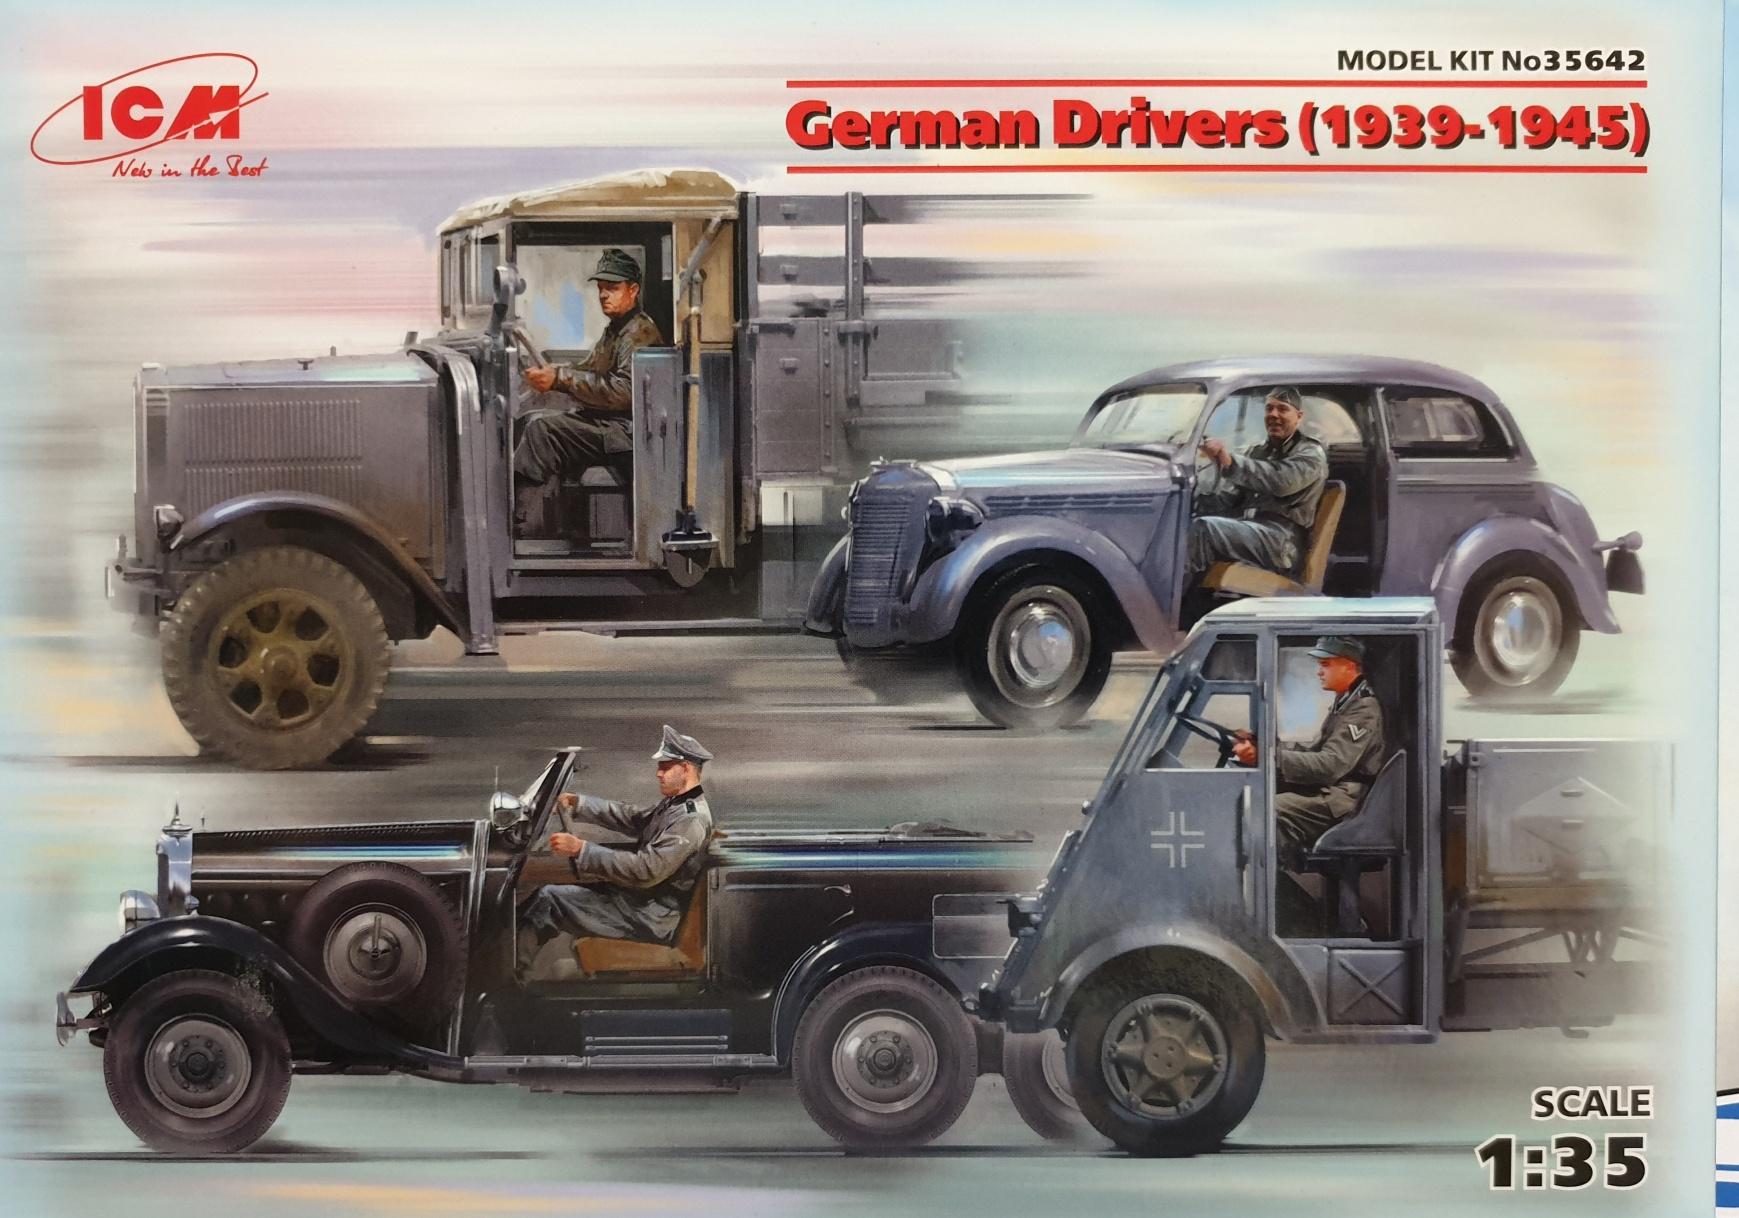 ICM 35642 German Drivers (1939-1945)